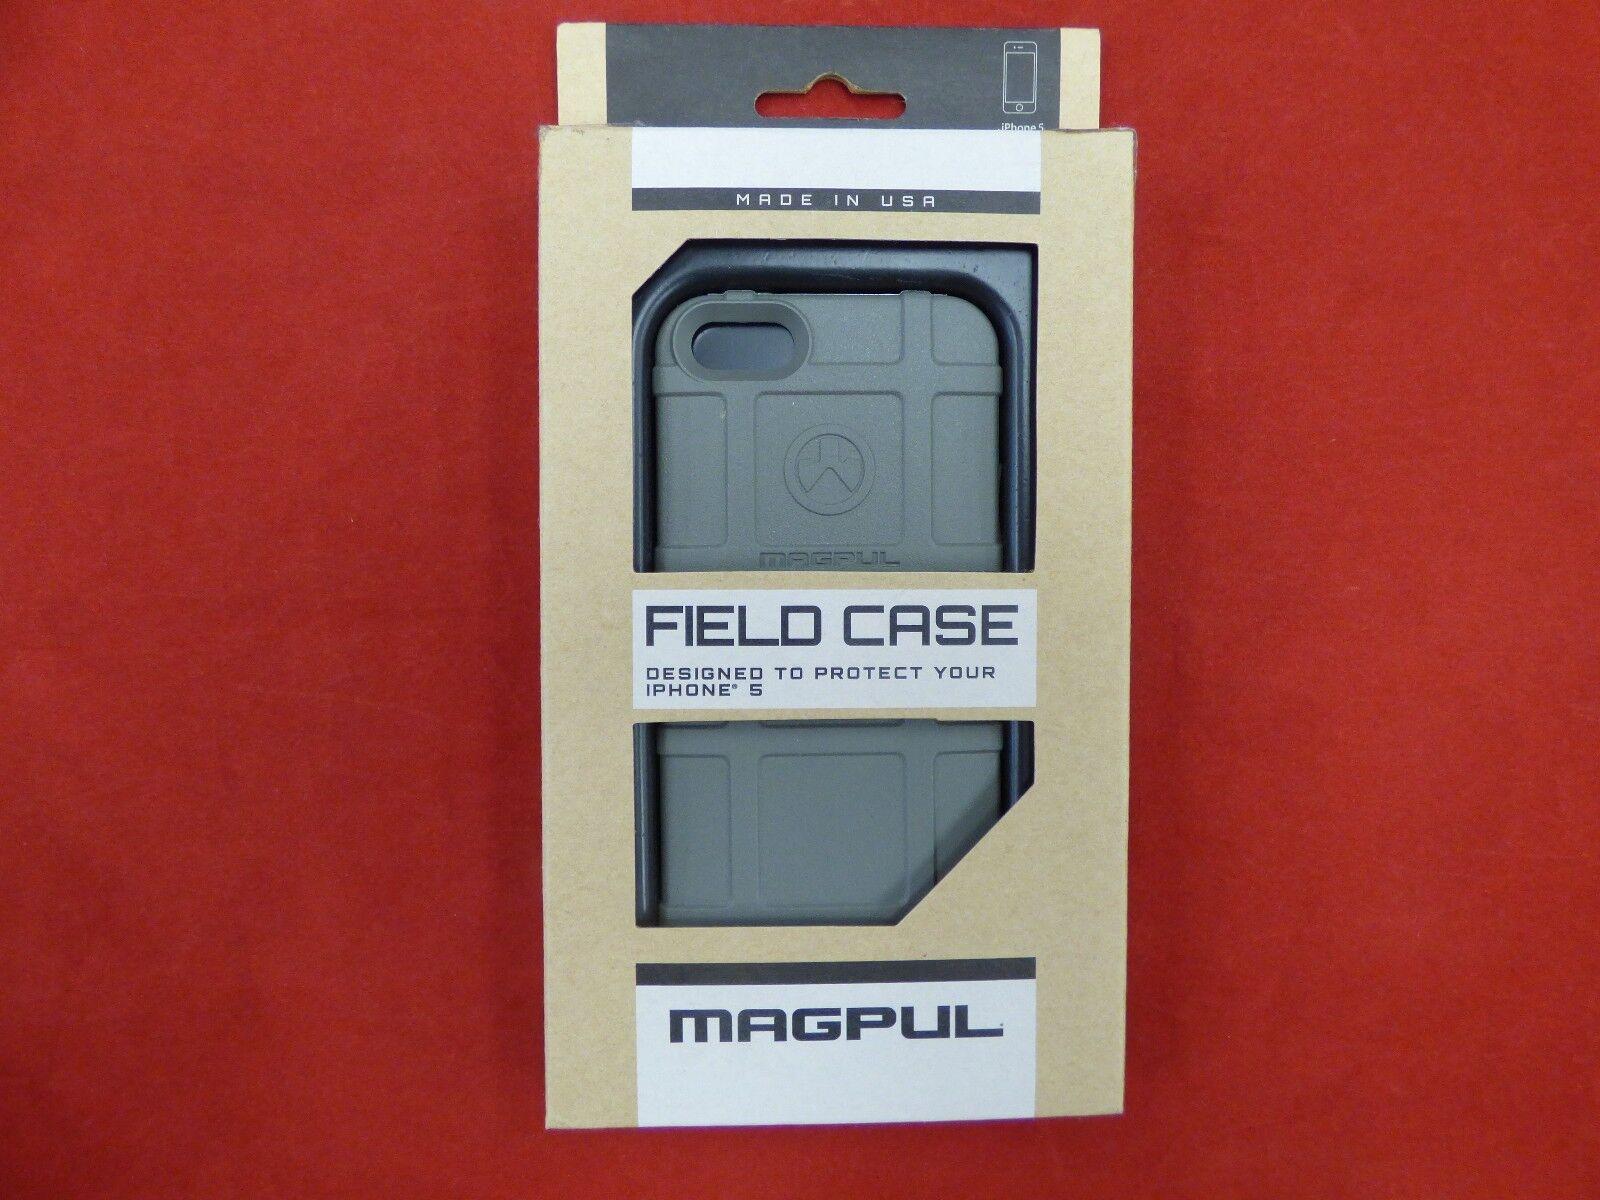 Magpul Apple iPhone 5 Field Case Foliage Green Mpimag452fol